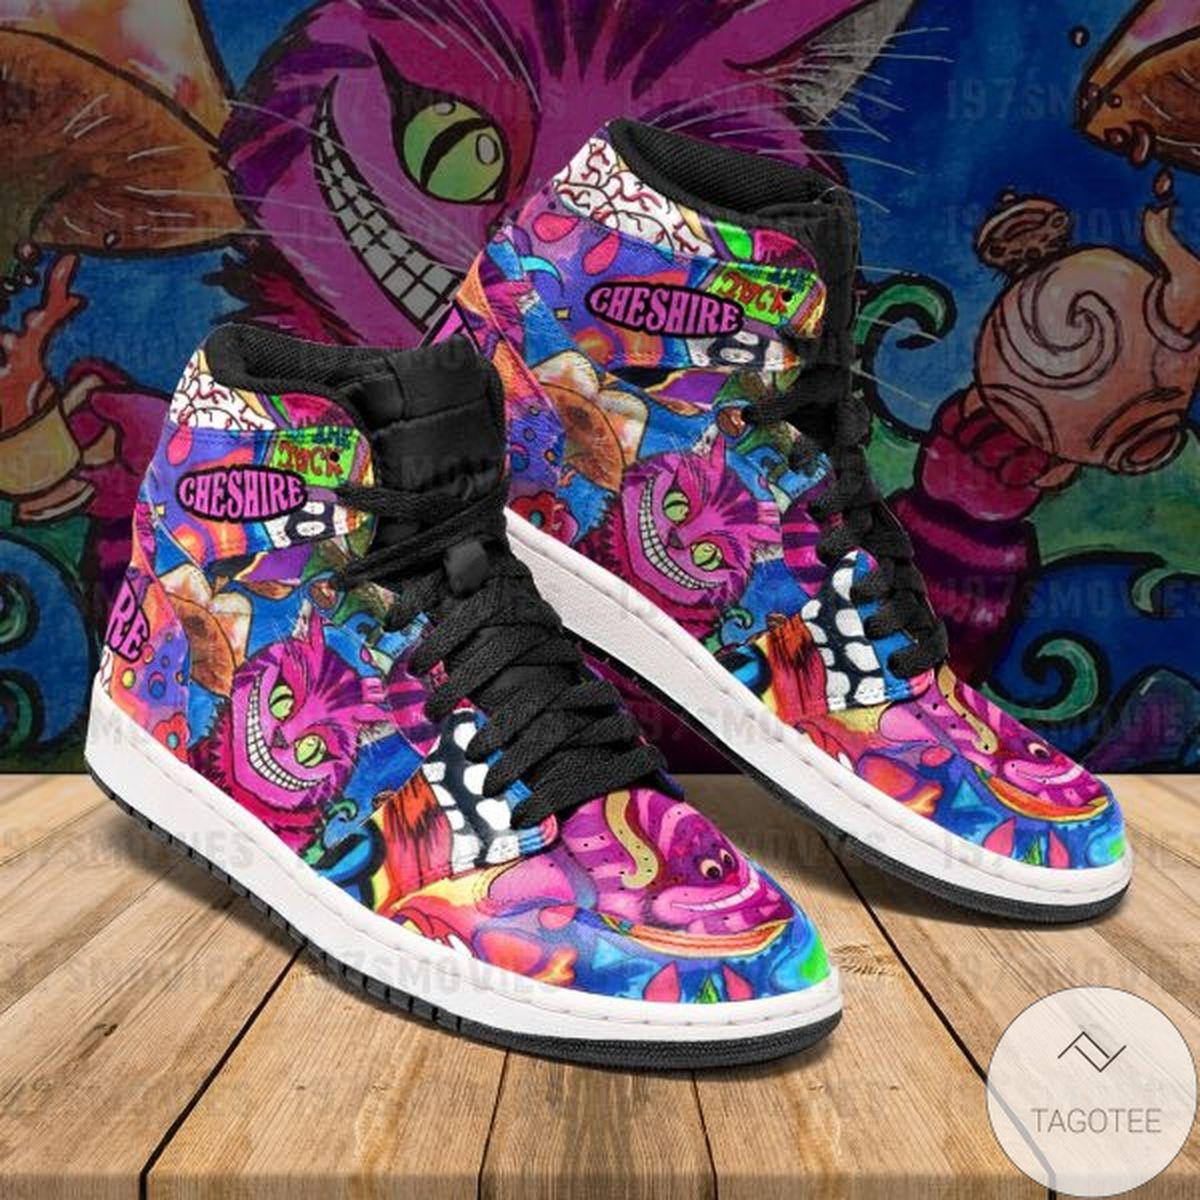 Hot Deal Cheshire Cat Alice's Adventures in Wonderland Sneaker Air Jordan High Top Shoes